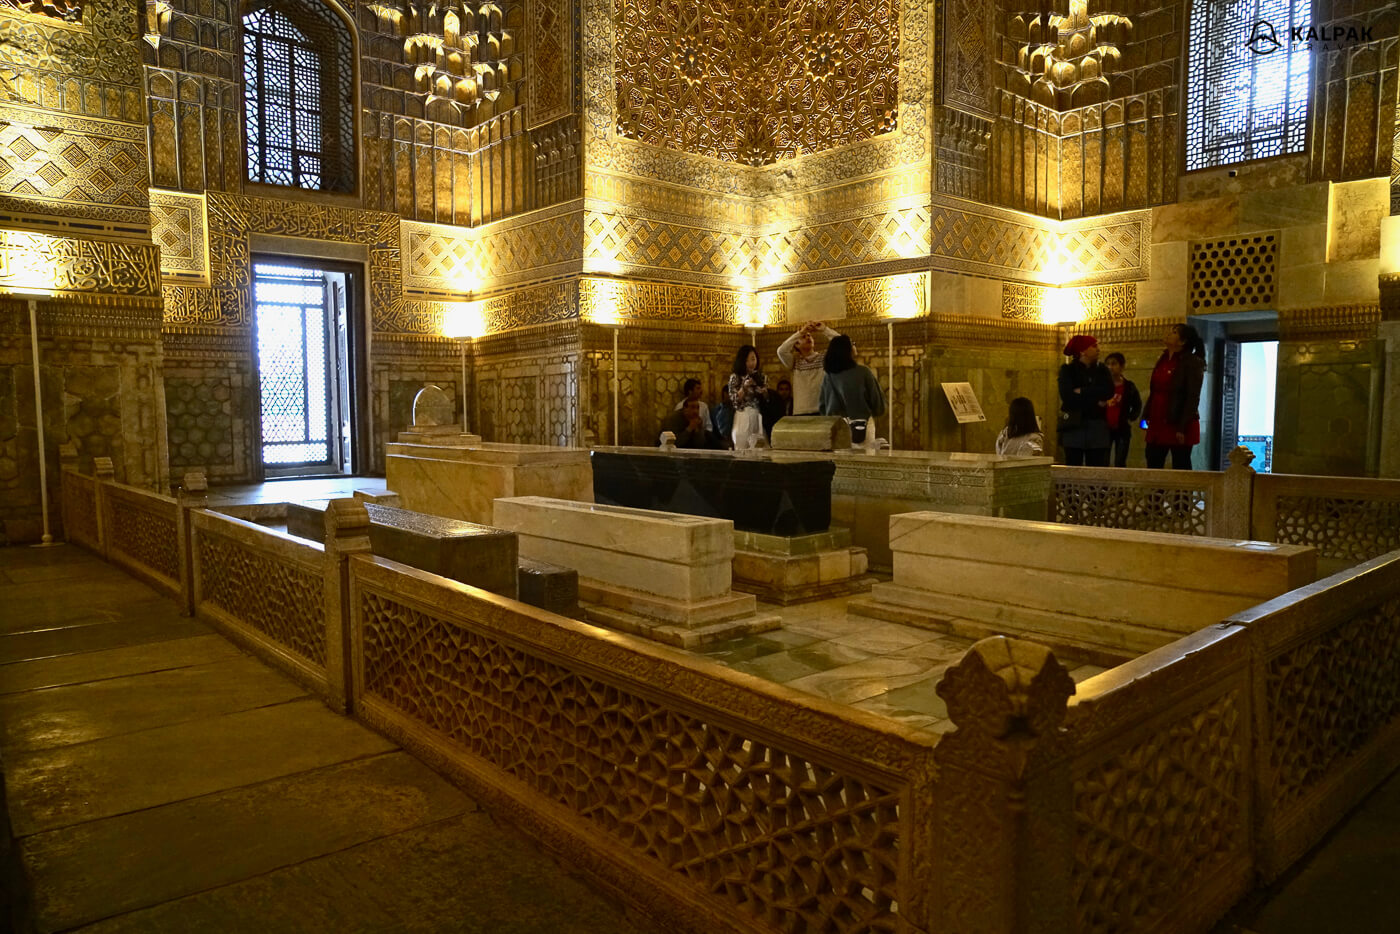 Gur emir mausoleum in Samarkand